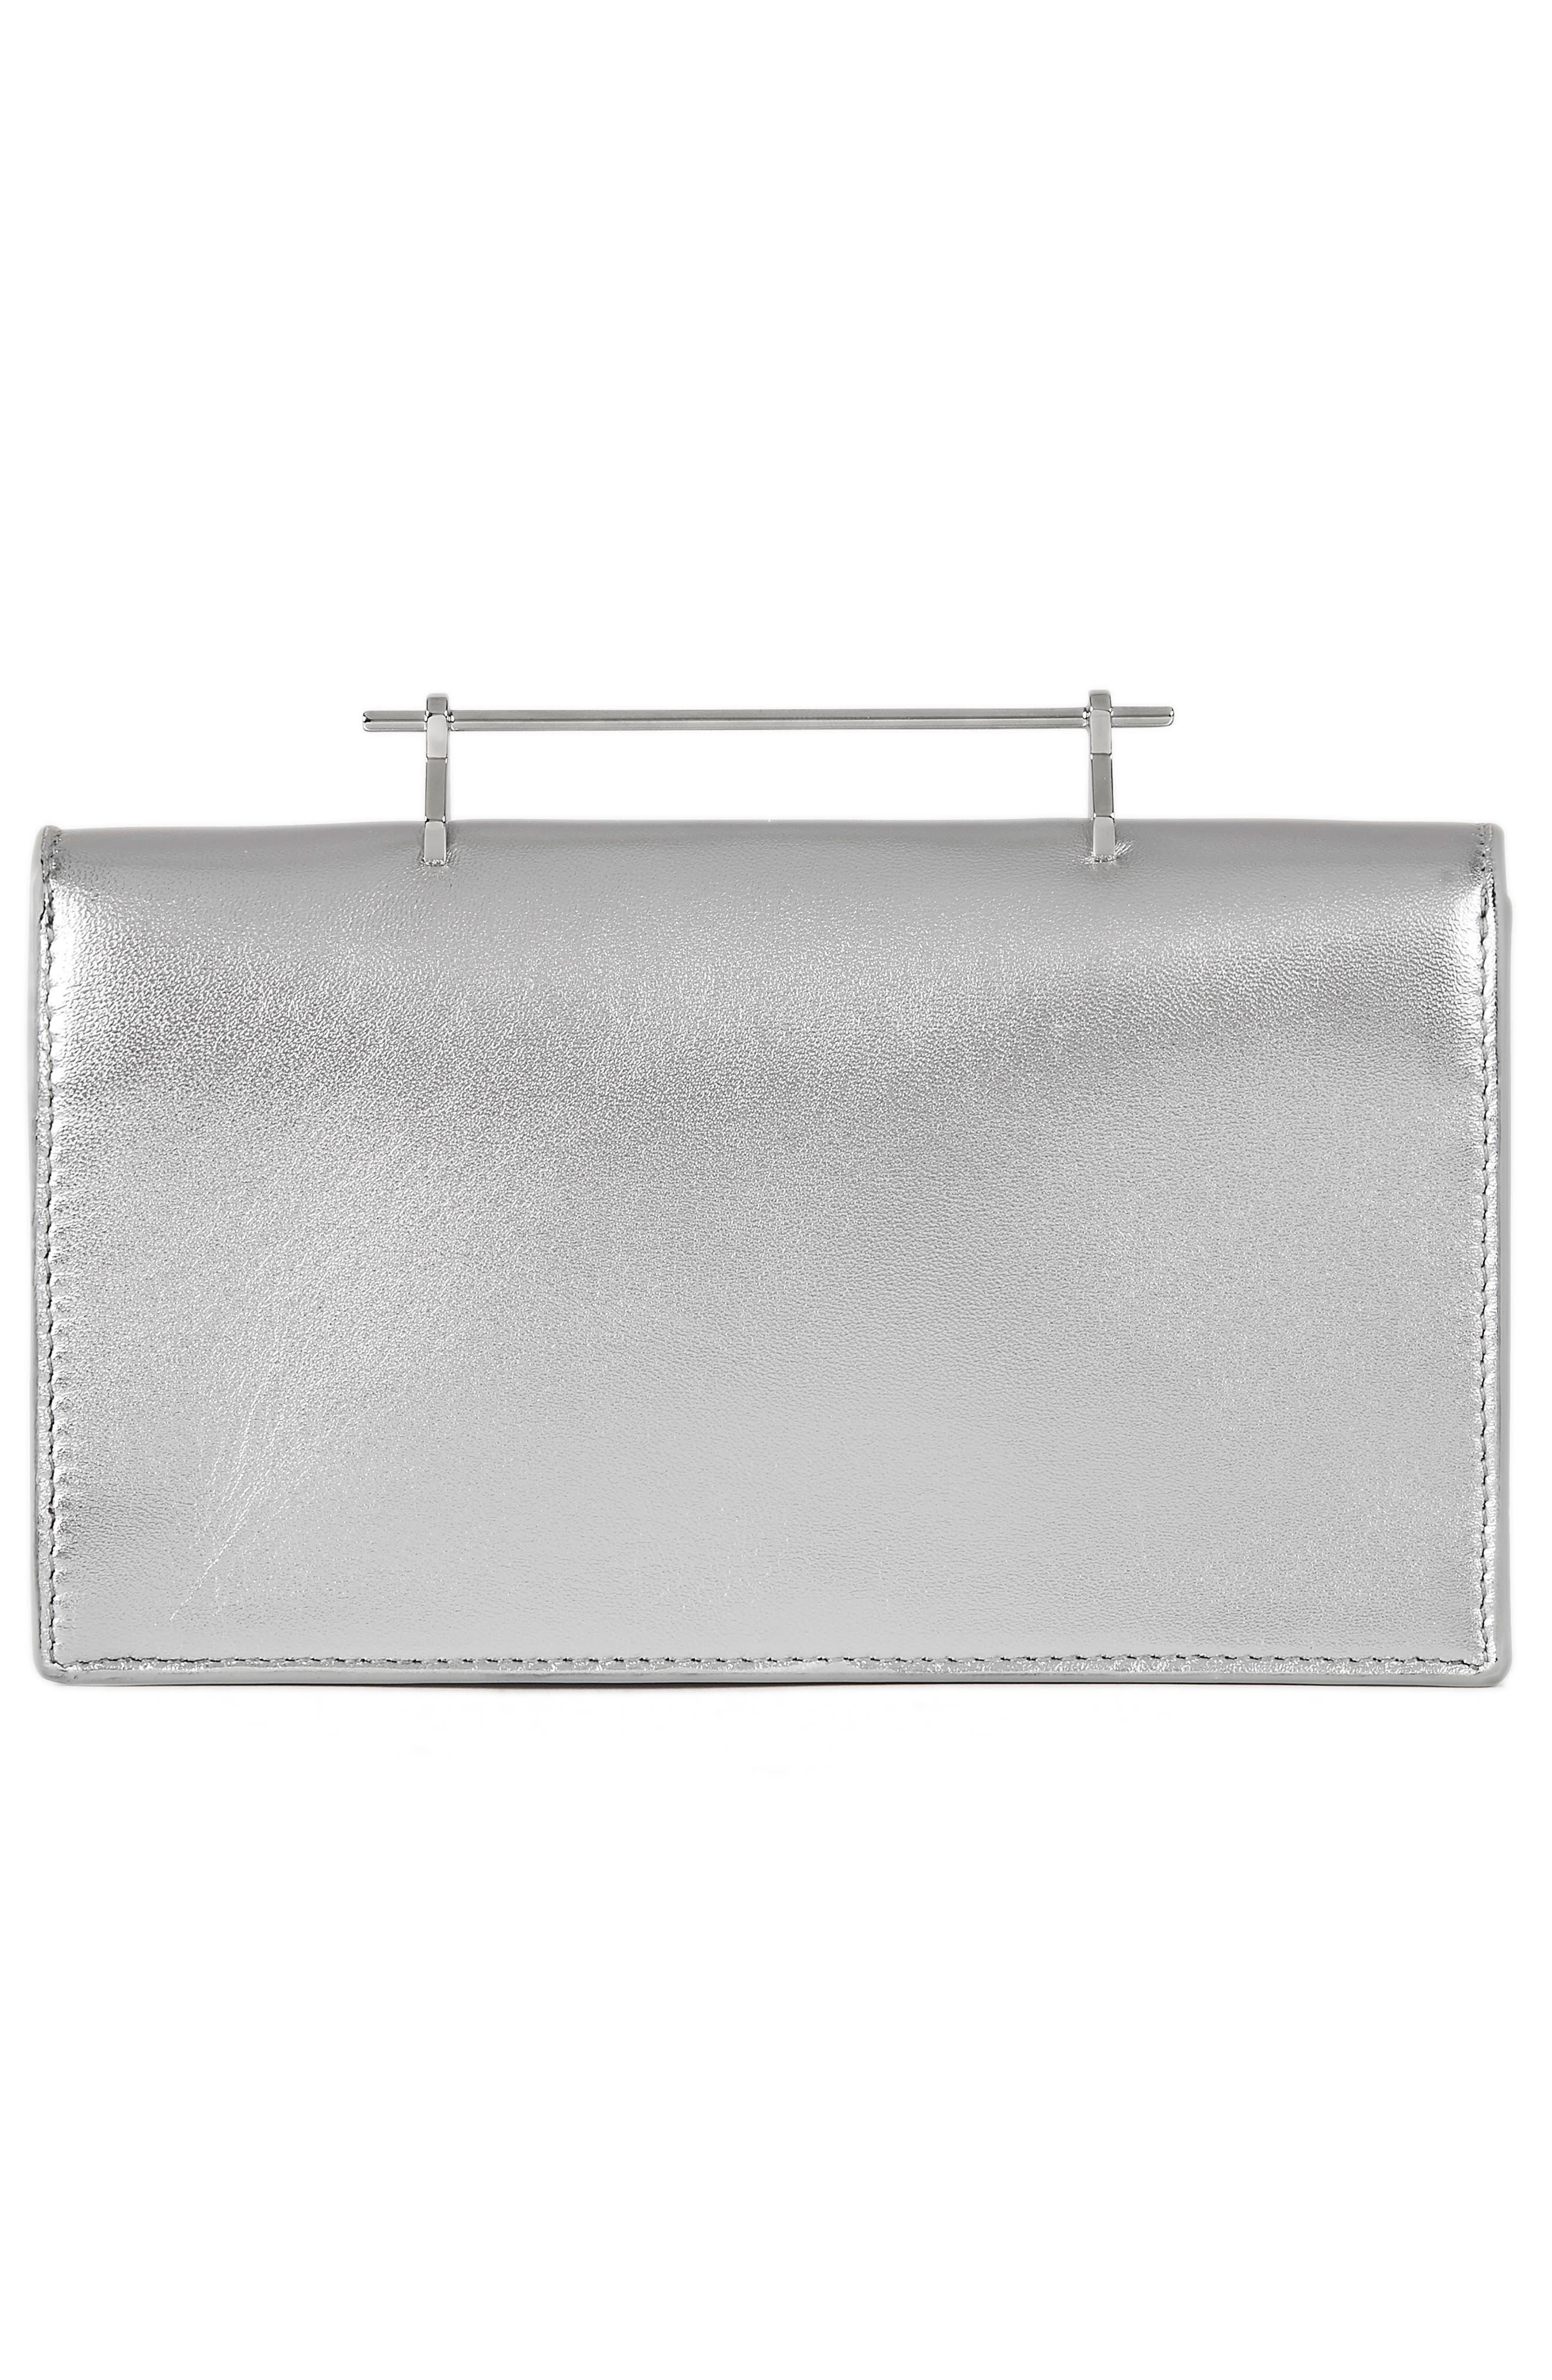 Alexia Metallic Leather Shoulder Bag,                             Alternate thumbnail 2, color,                             Metallic Silver/ Silver